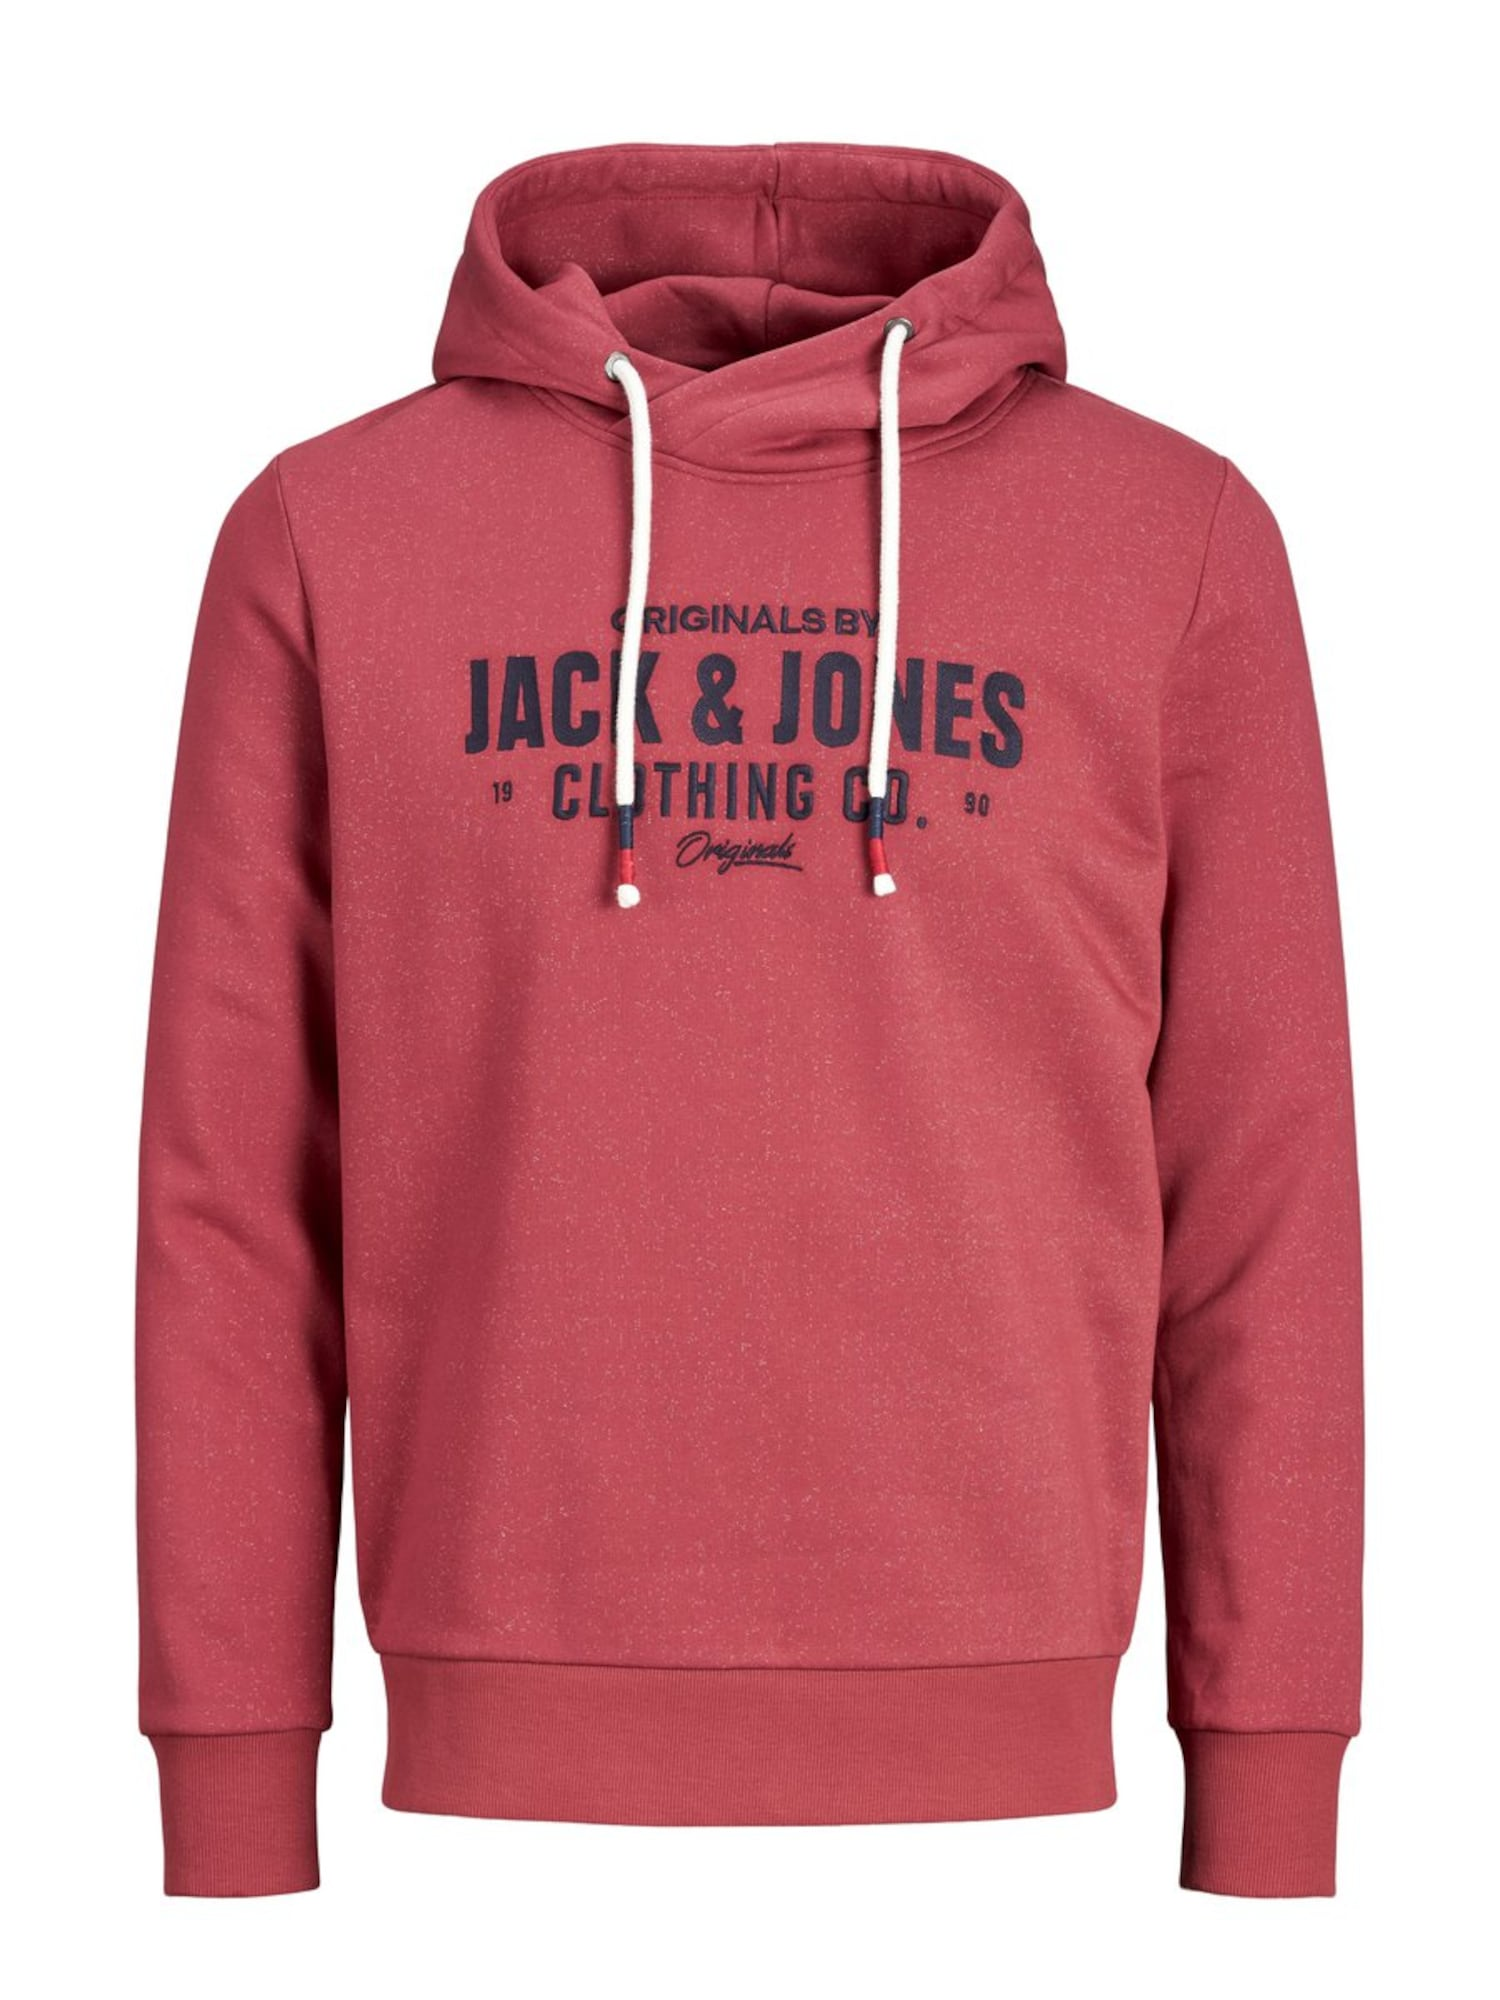 Herren jack & jones Hoodie blau,  rot,  weiß, pink,  schwarz | 05714500749059